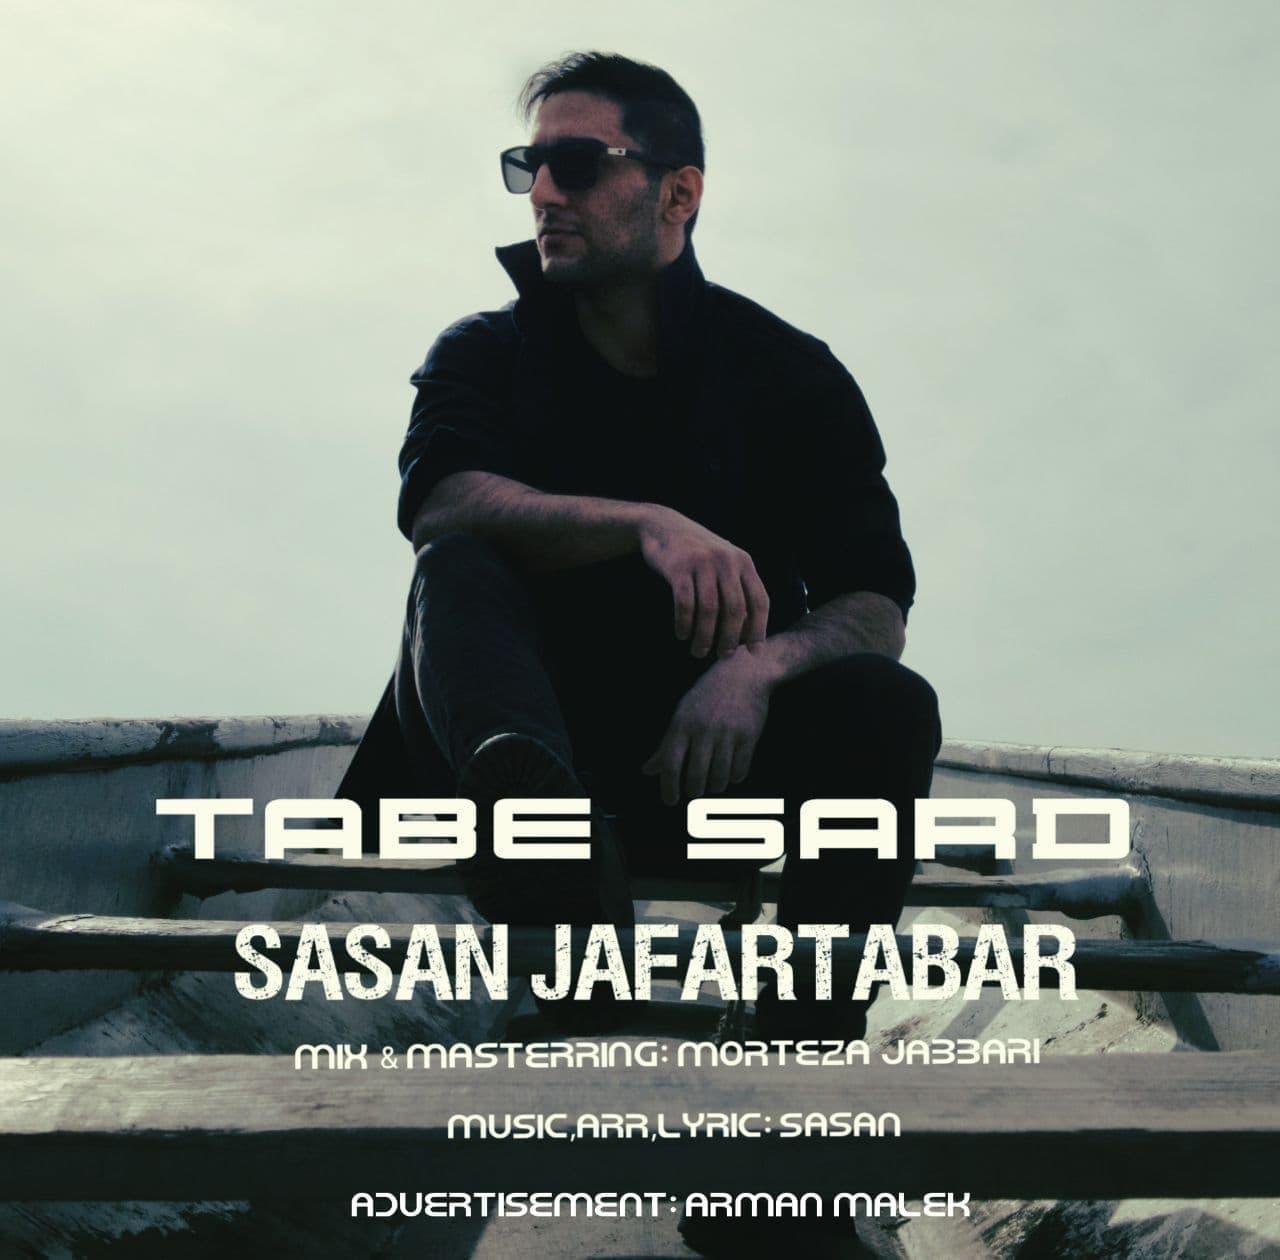 Sasan Jafartabar – Tabe Sard